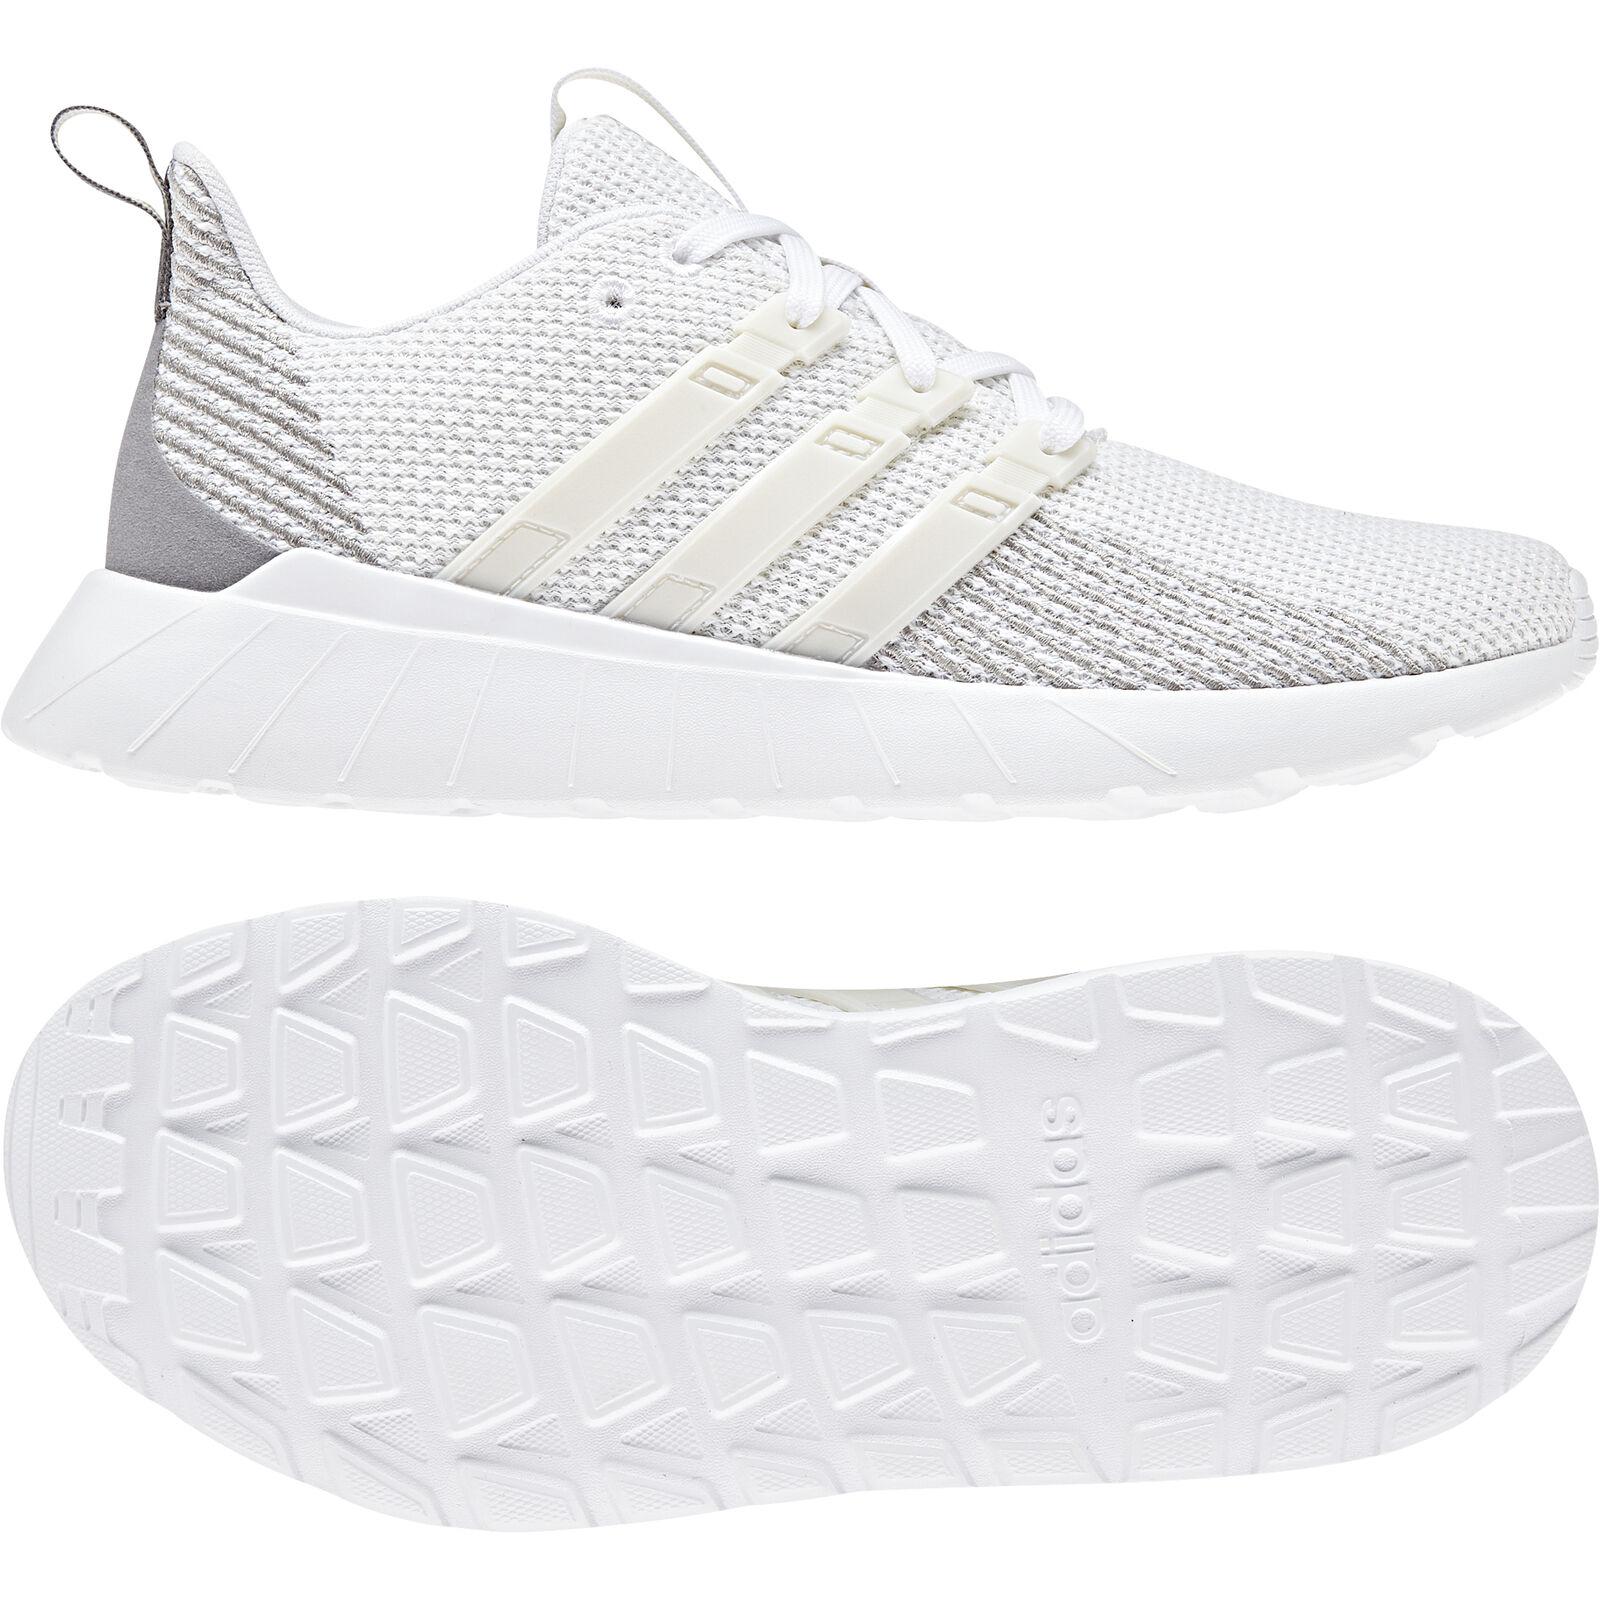 Adidas Questar FFaible femmes FonctionneHommest chaussures